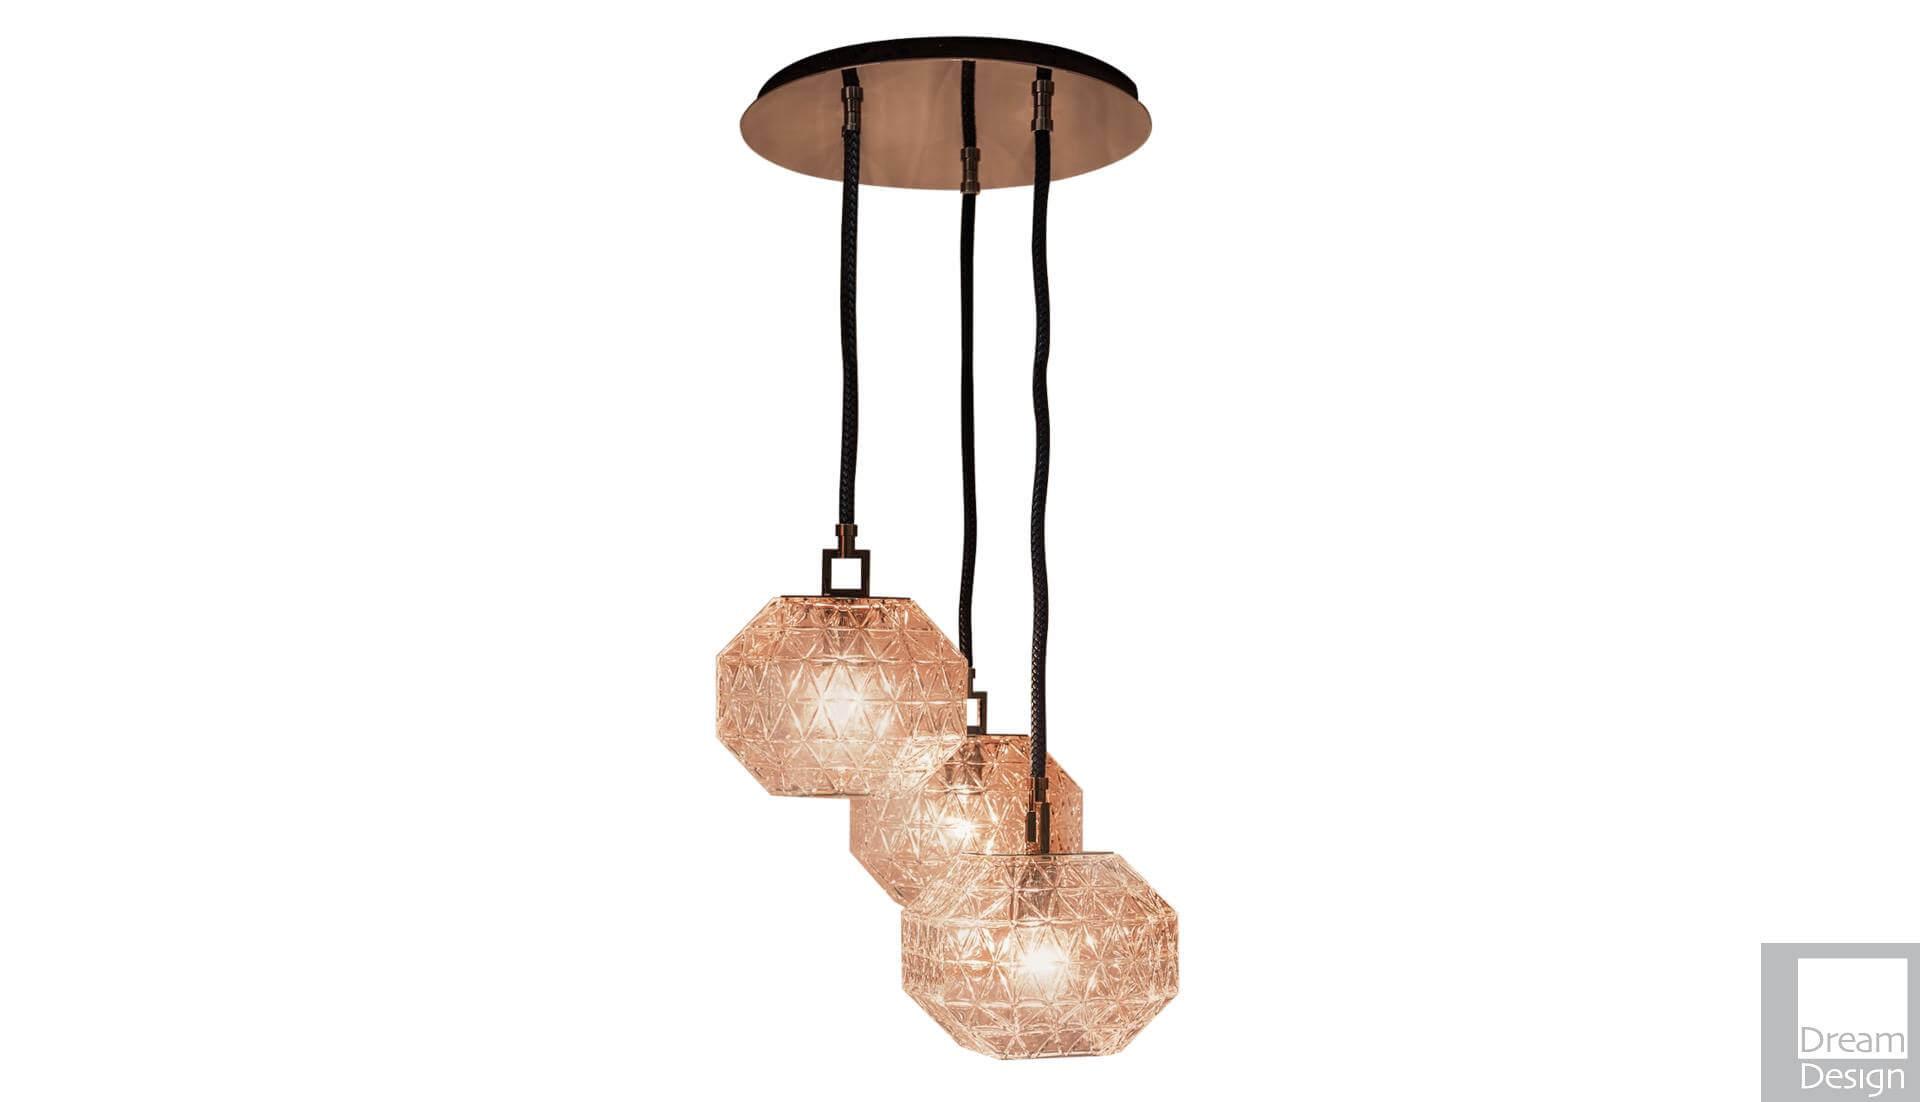 Contardi Treasure 3 Cluster Light